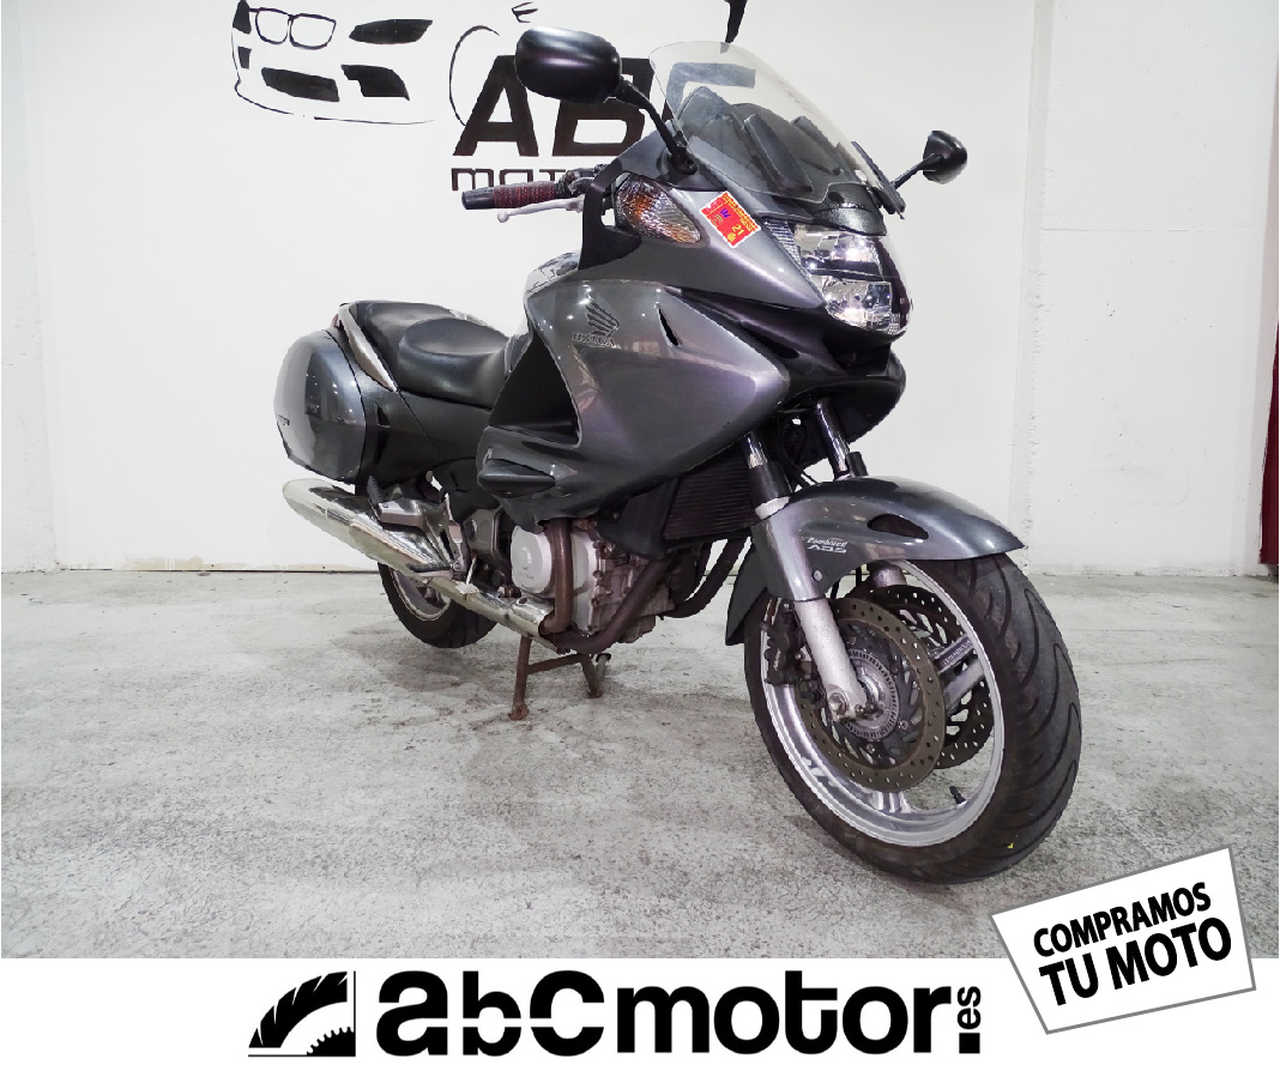 Honda Deauville NT 700 V ABS  - Foto 1